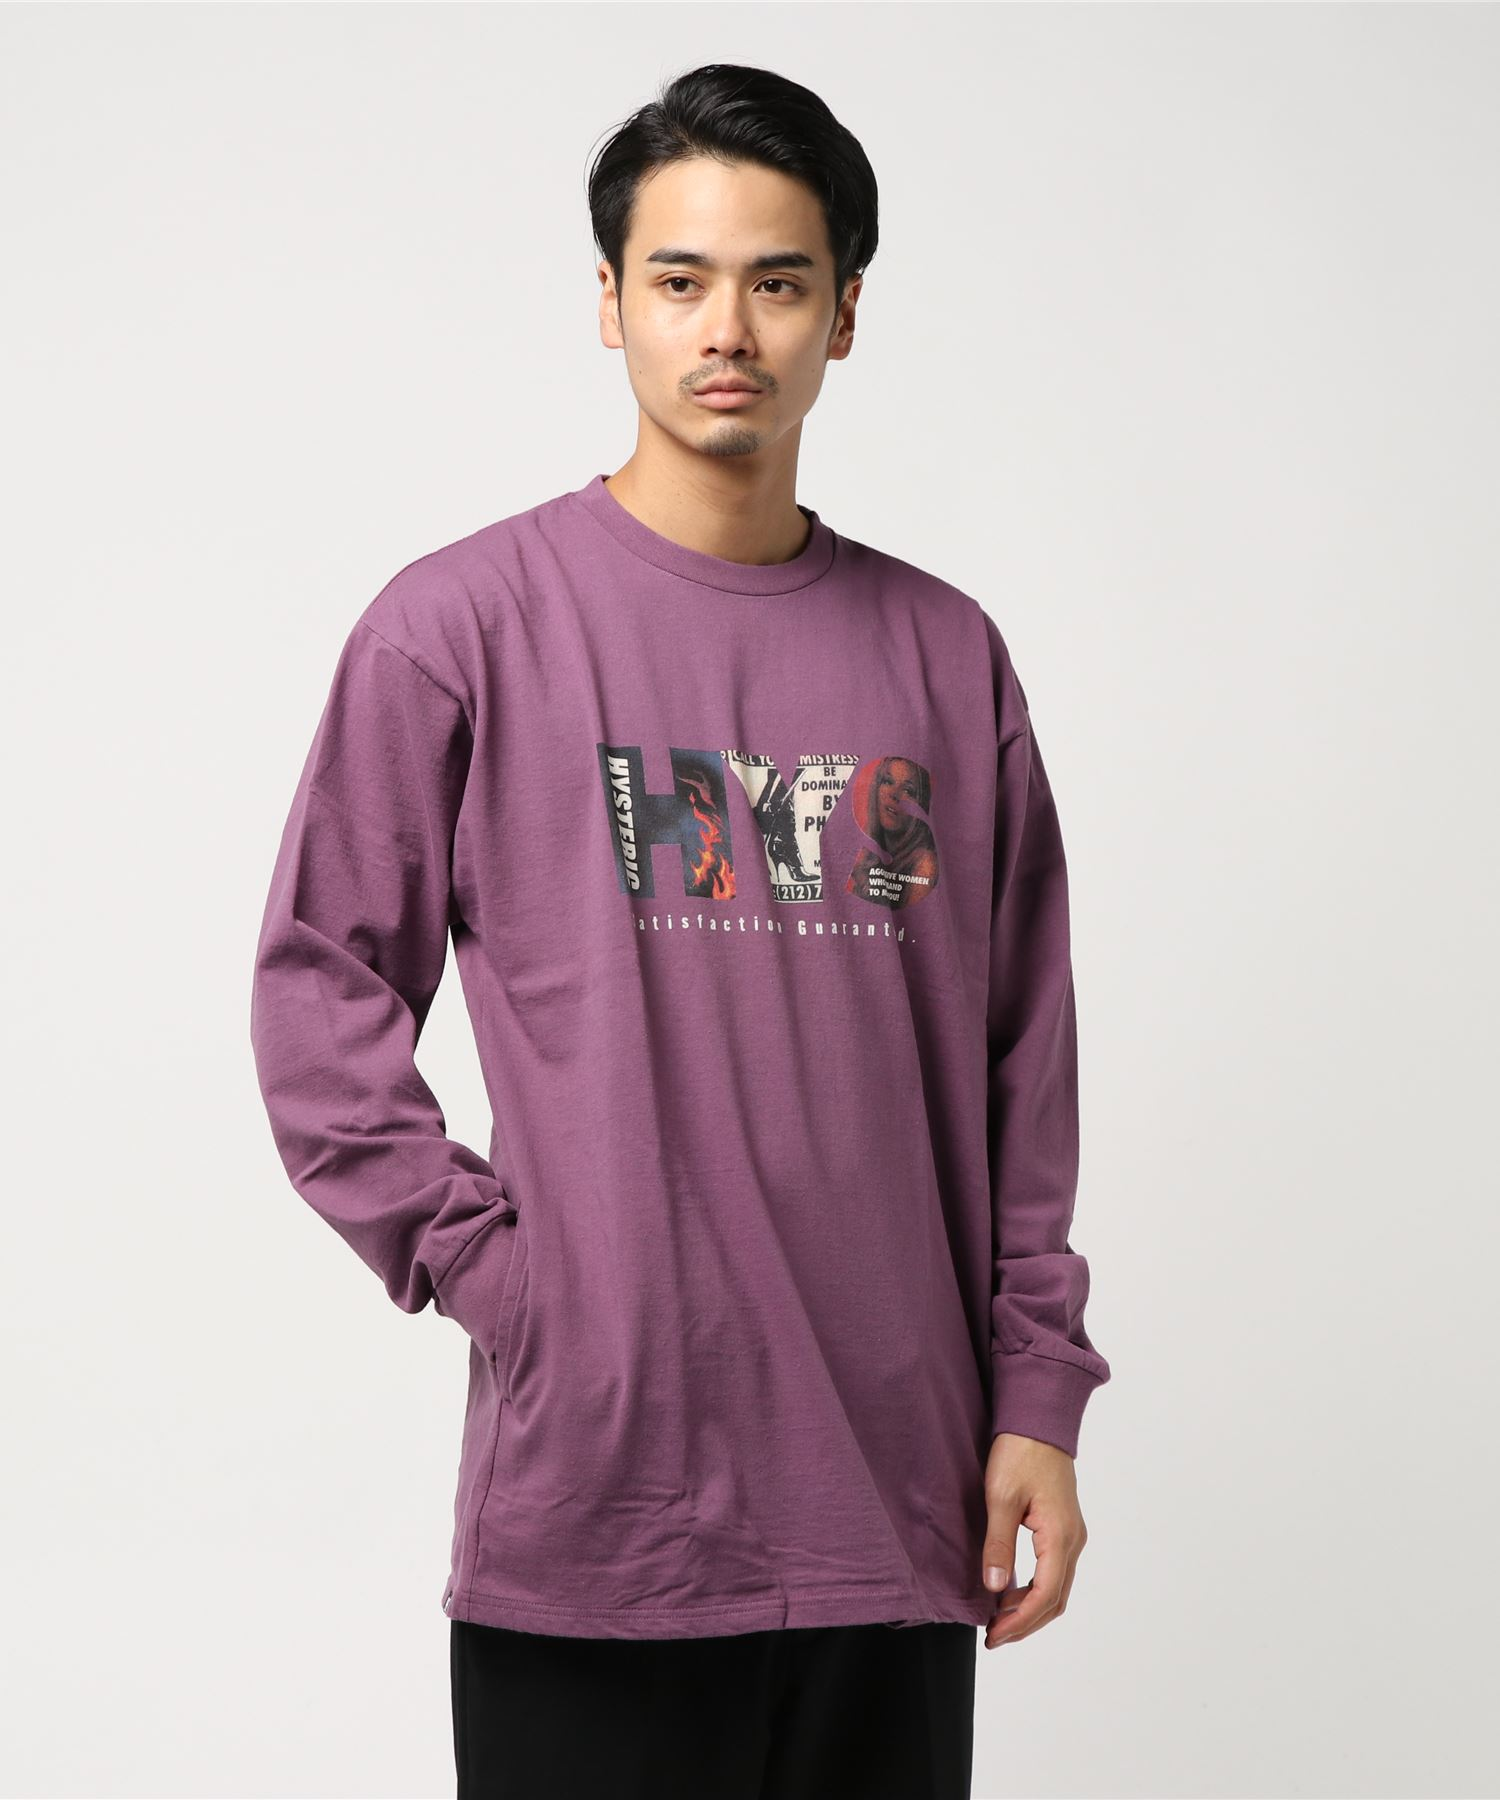 HYS SATISFACTION ポケ付Tシャツ